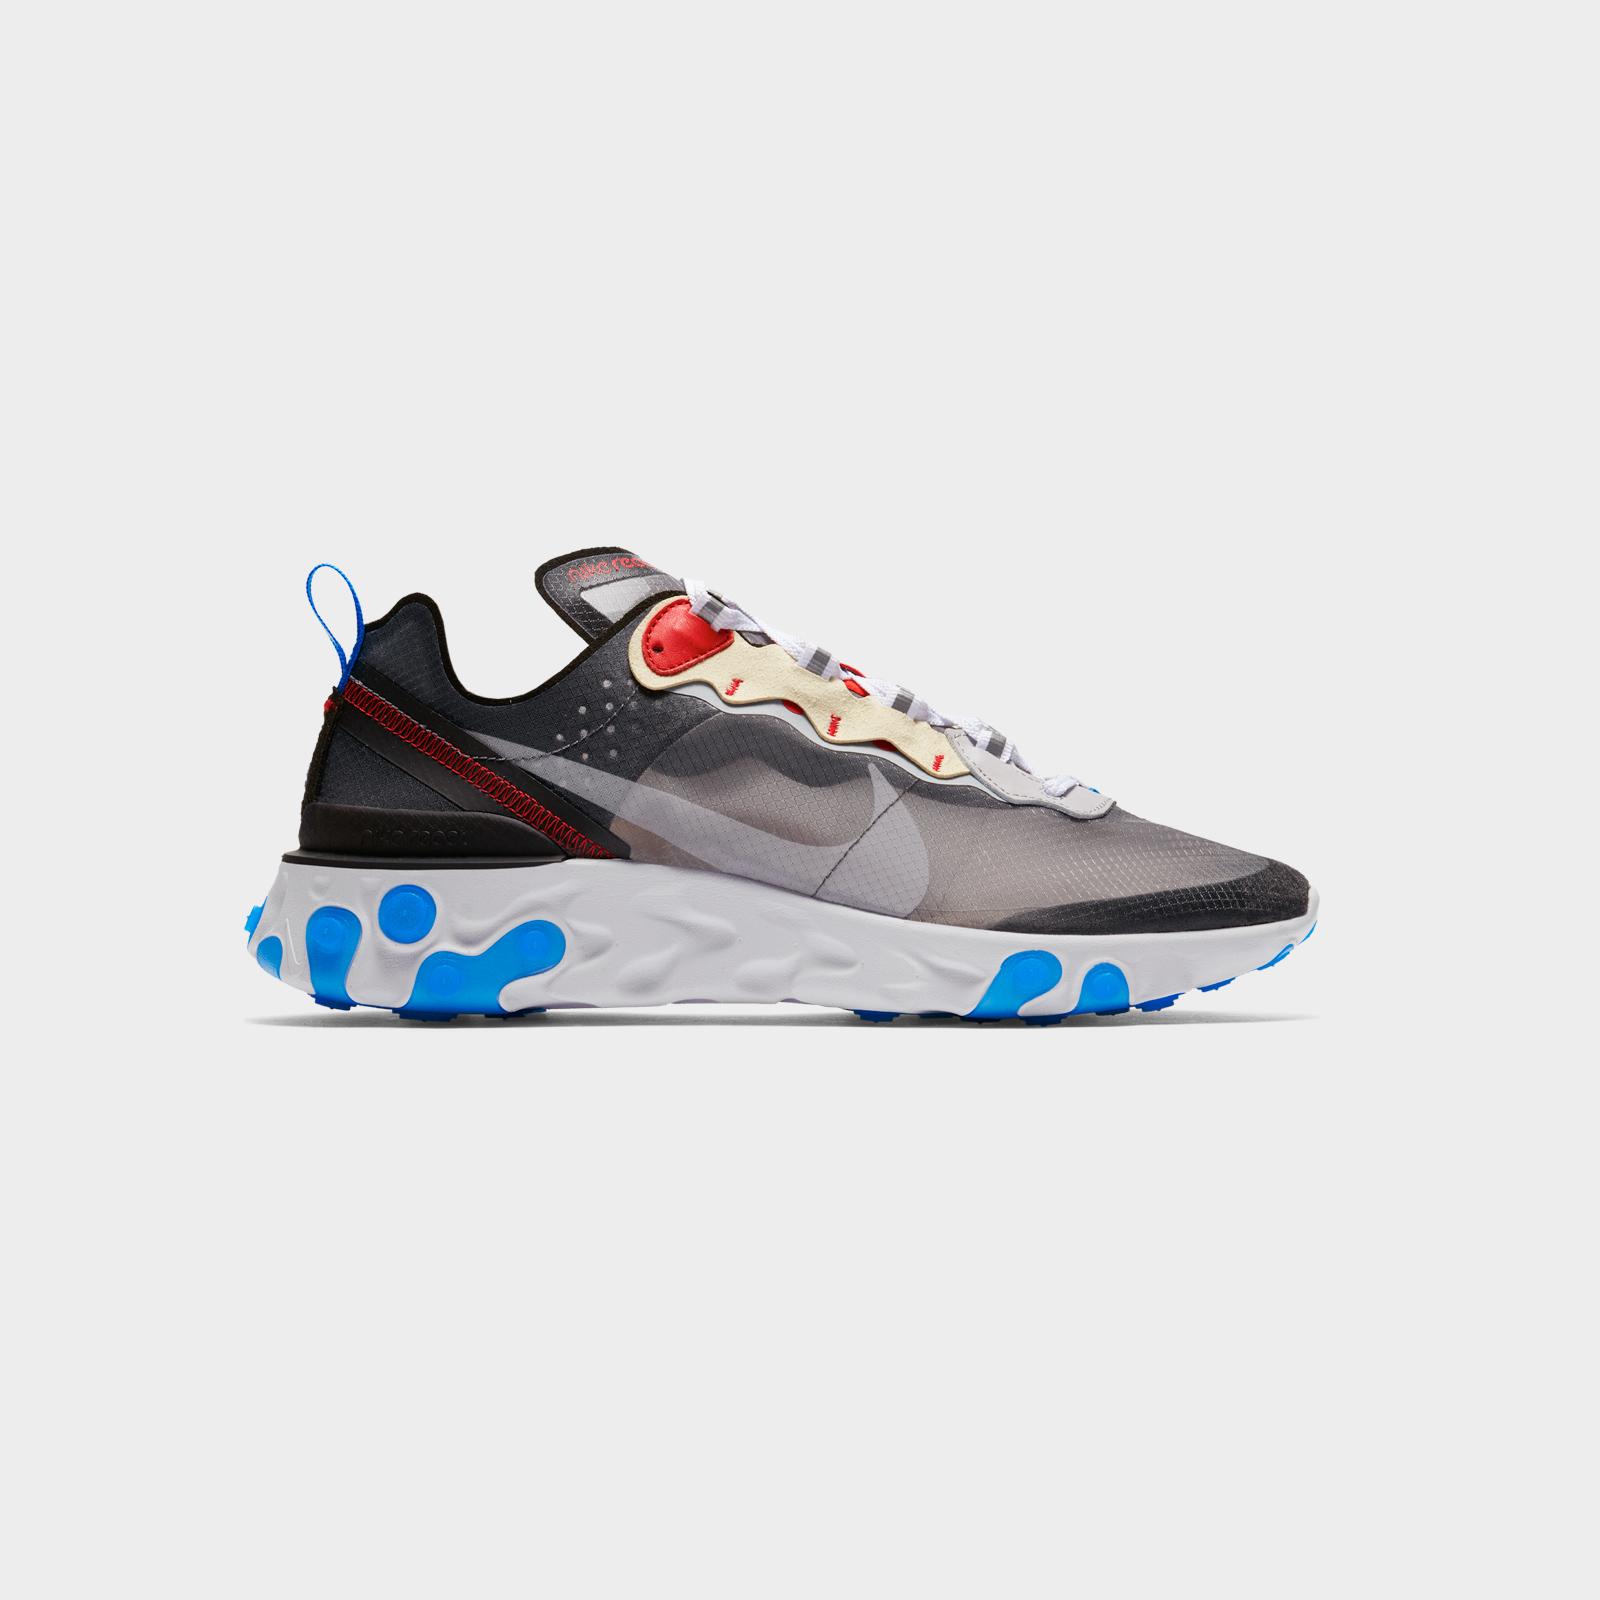 Nike React Element 87 - Aq1090-003 - Sneakersnstuff  4b551cde0